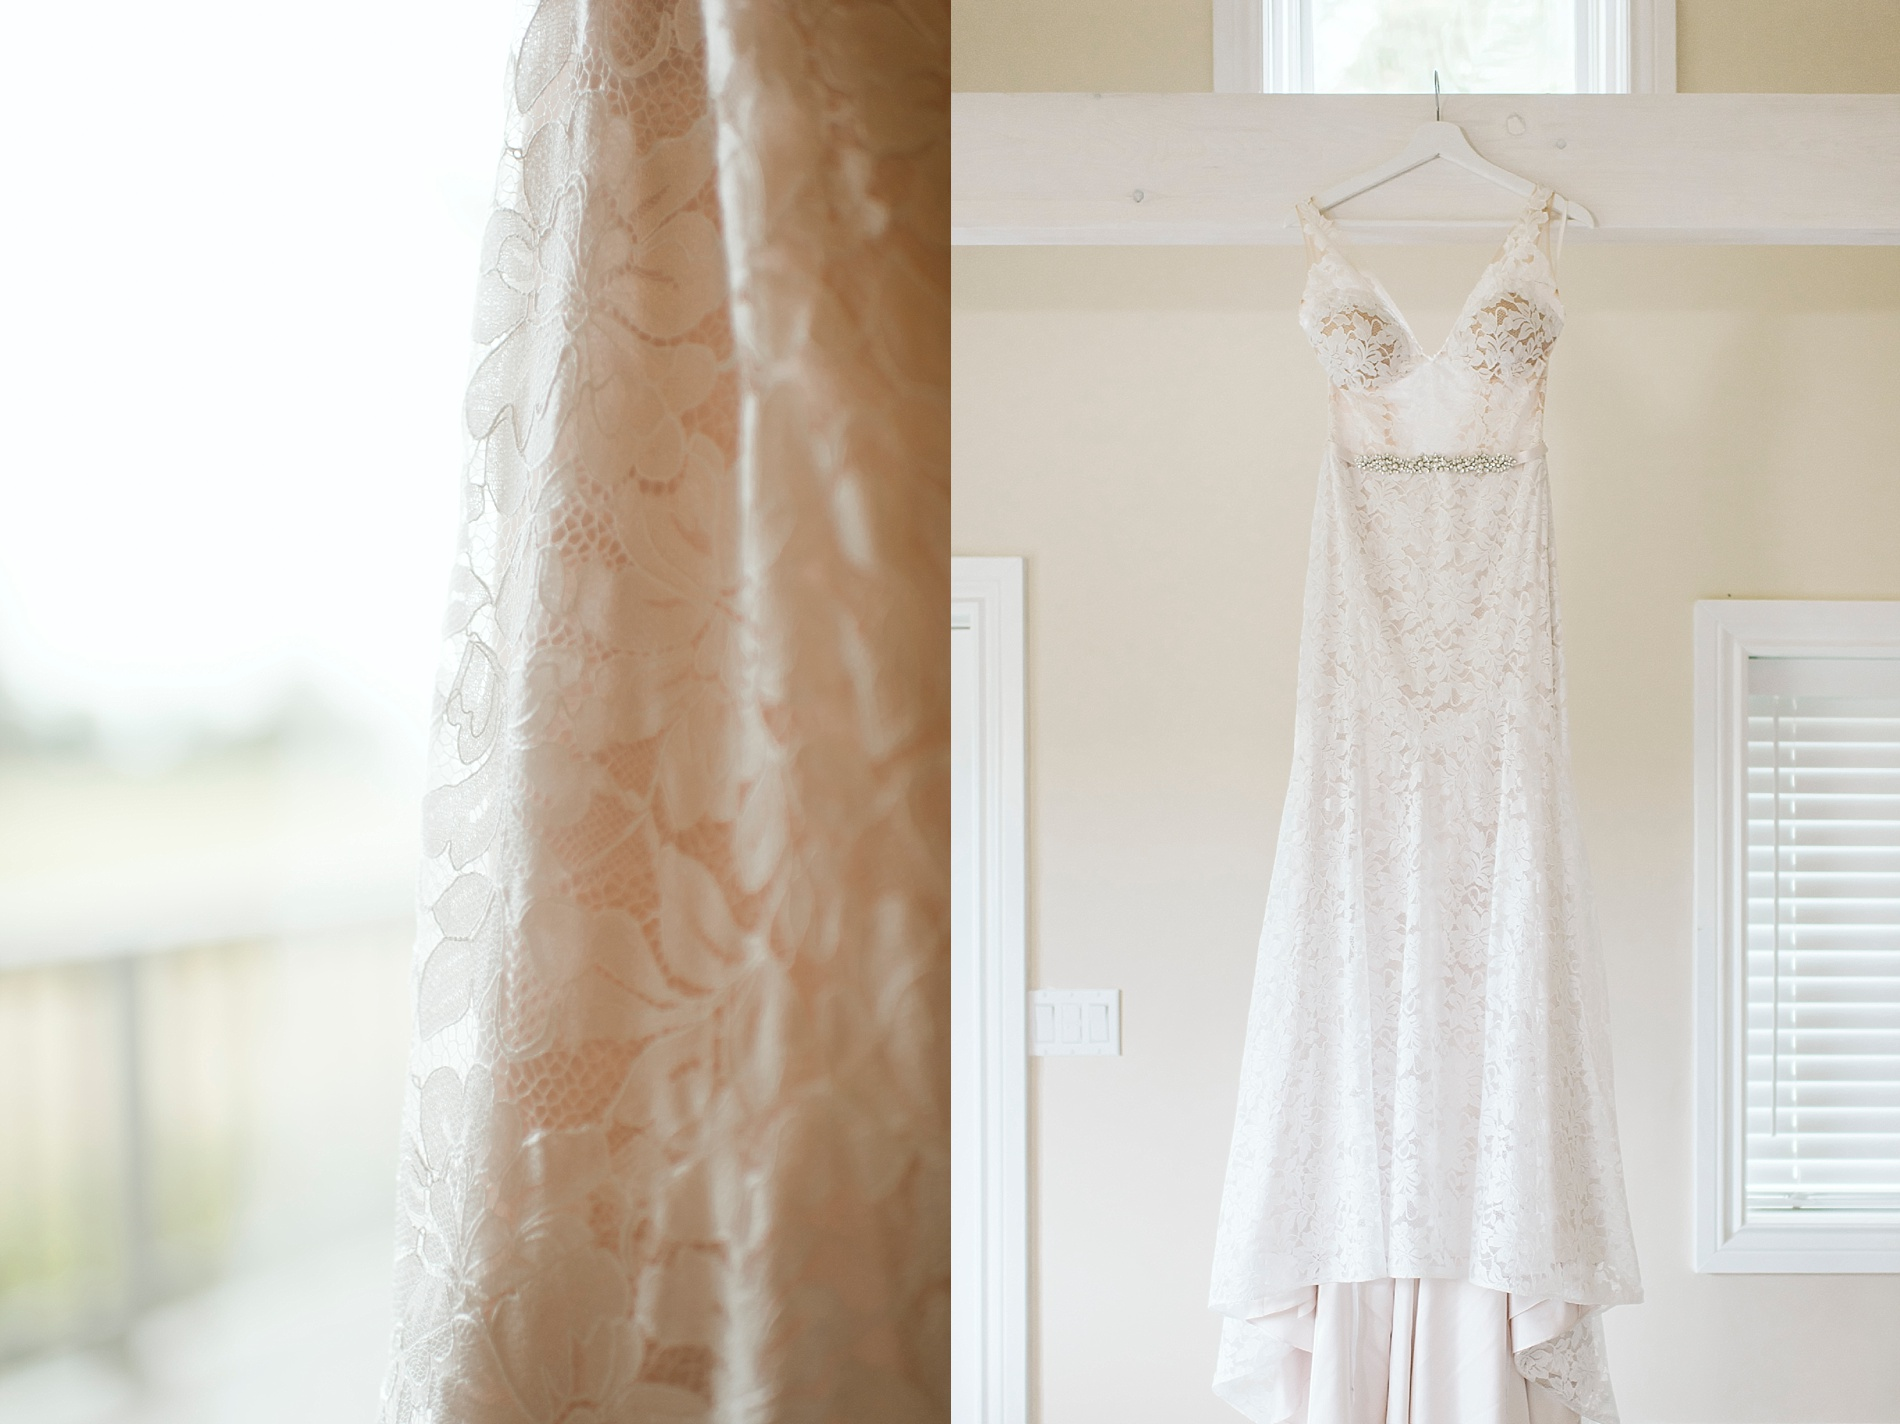 Kawartha_Lakes_Wedding_Bobcageon_Eganridge_Resort_Toronto_Photographer_0001.jpg